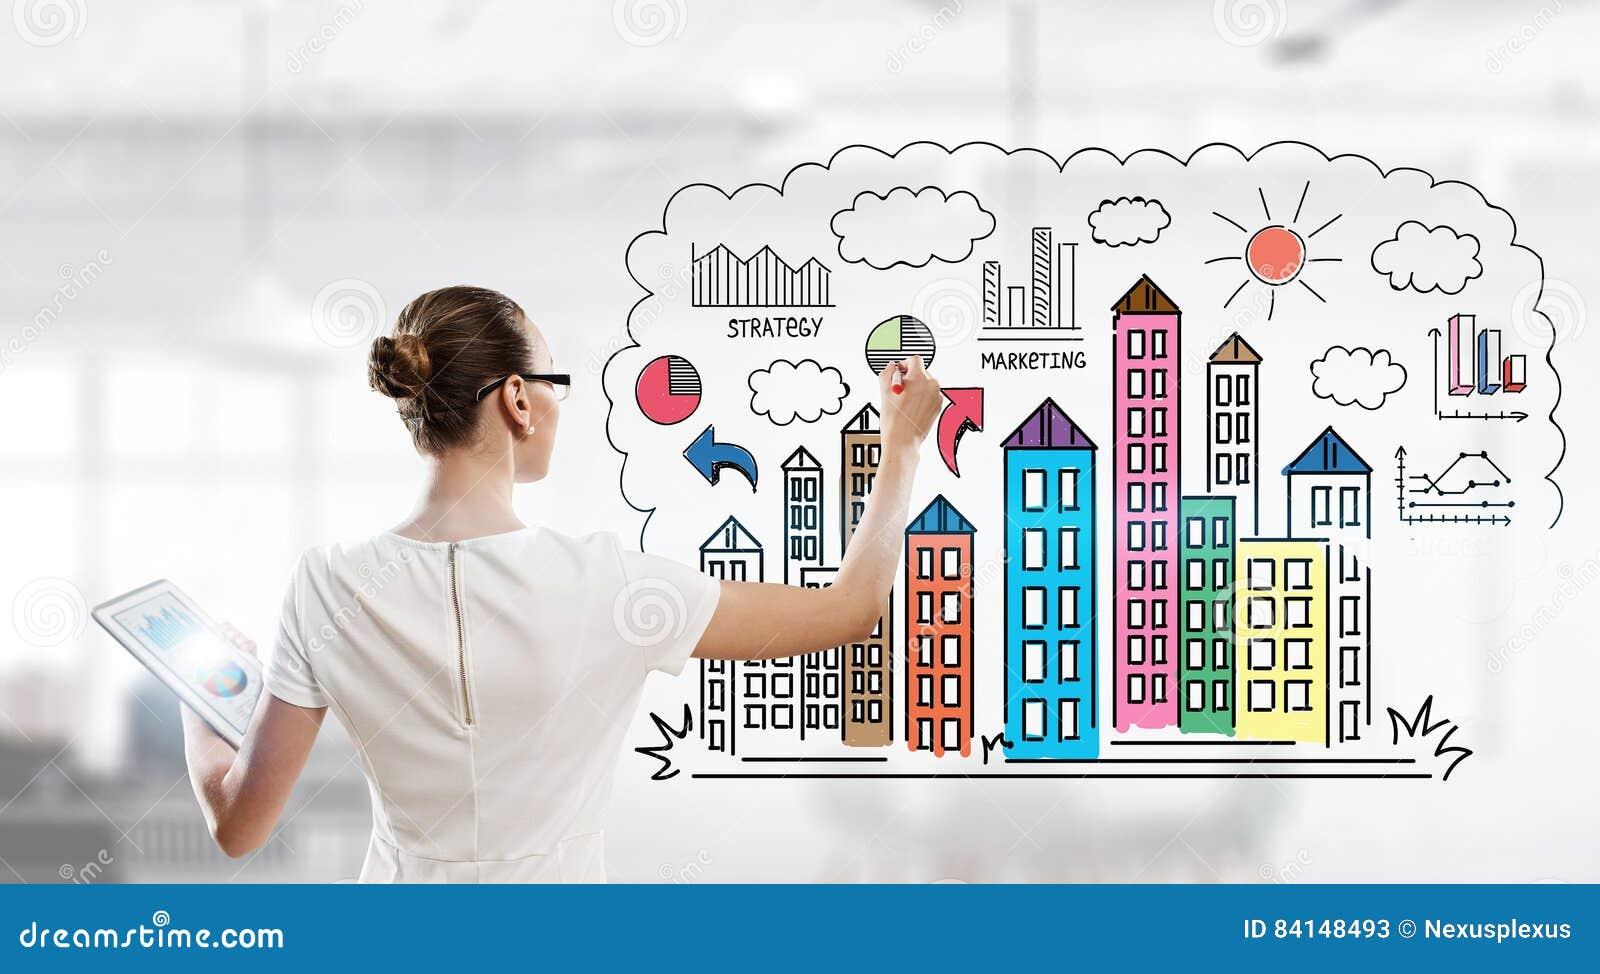 Бизнес план мультимедийных александр белов идеи бизнеса